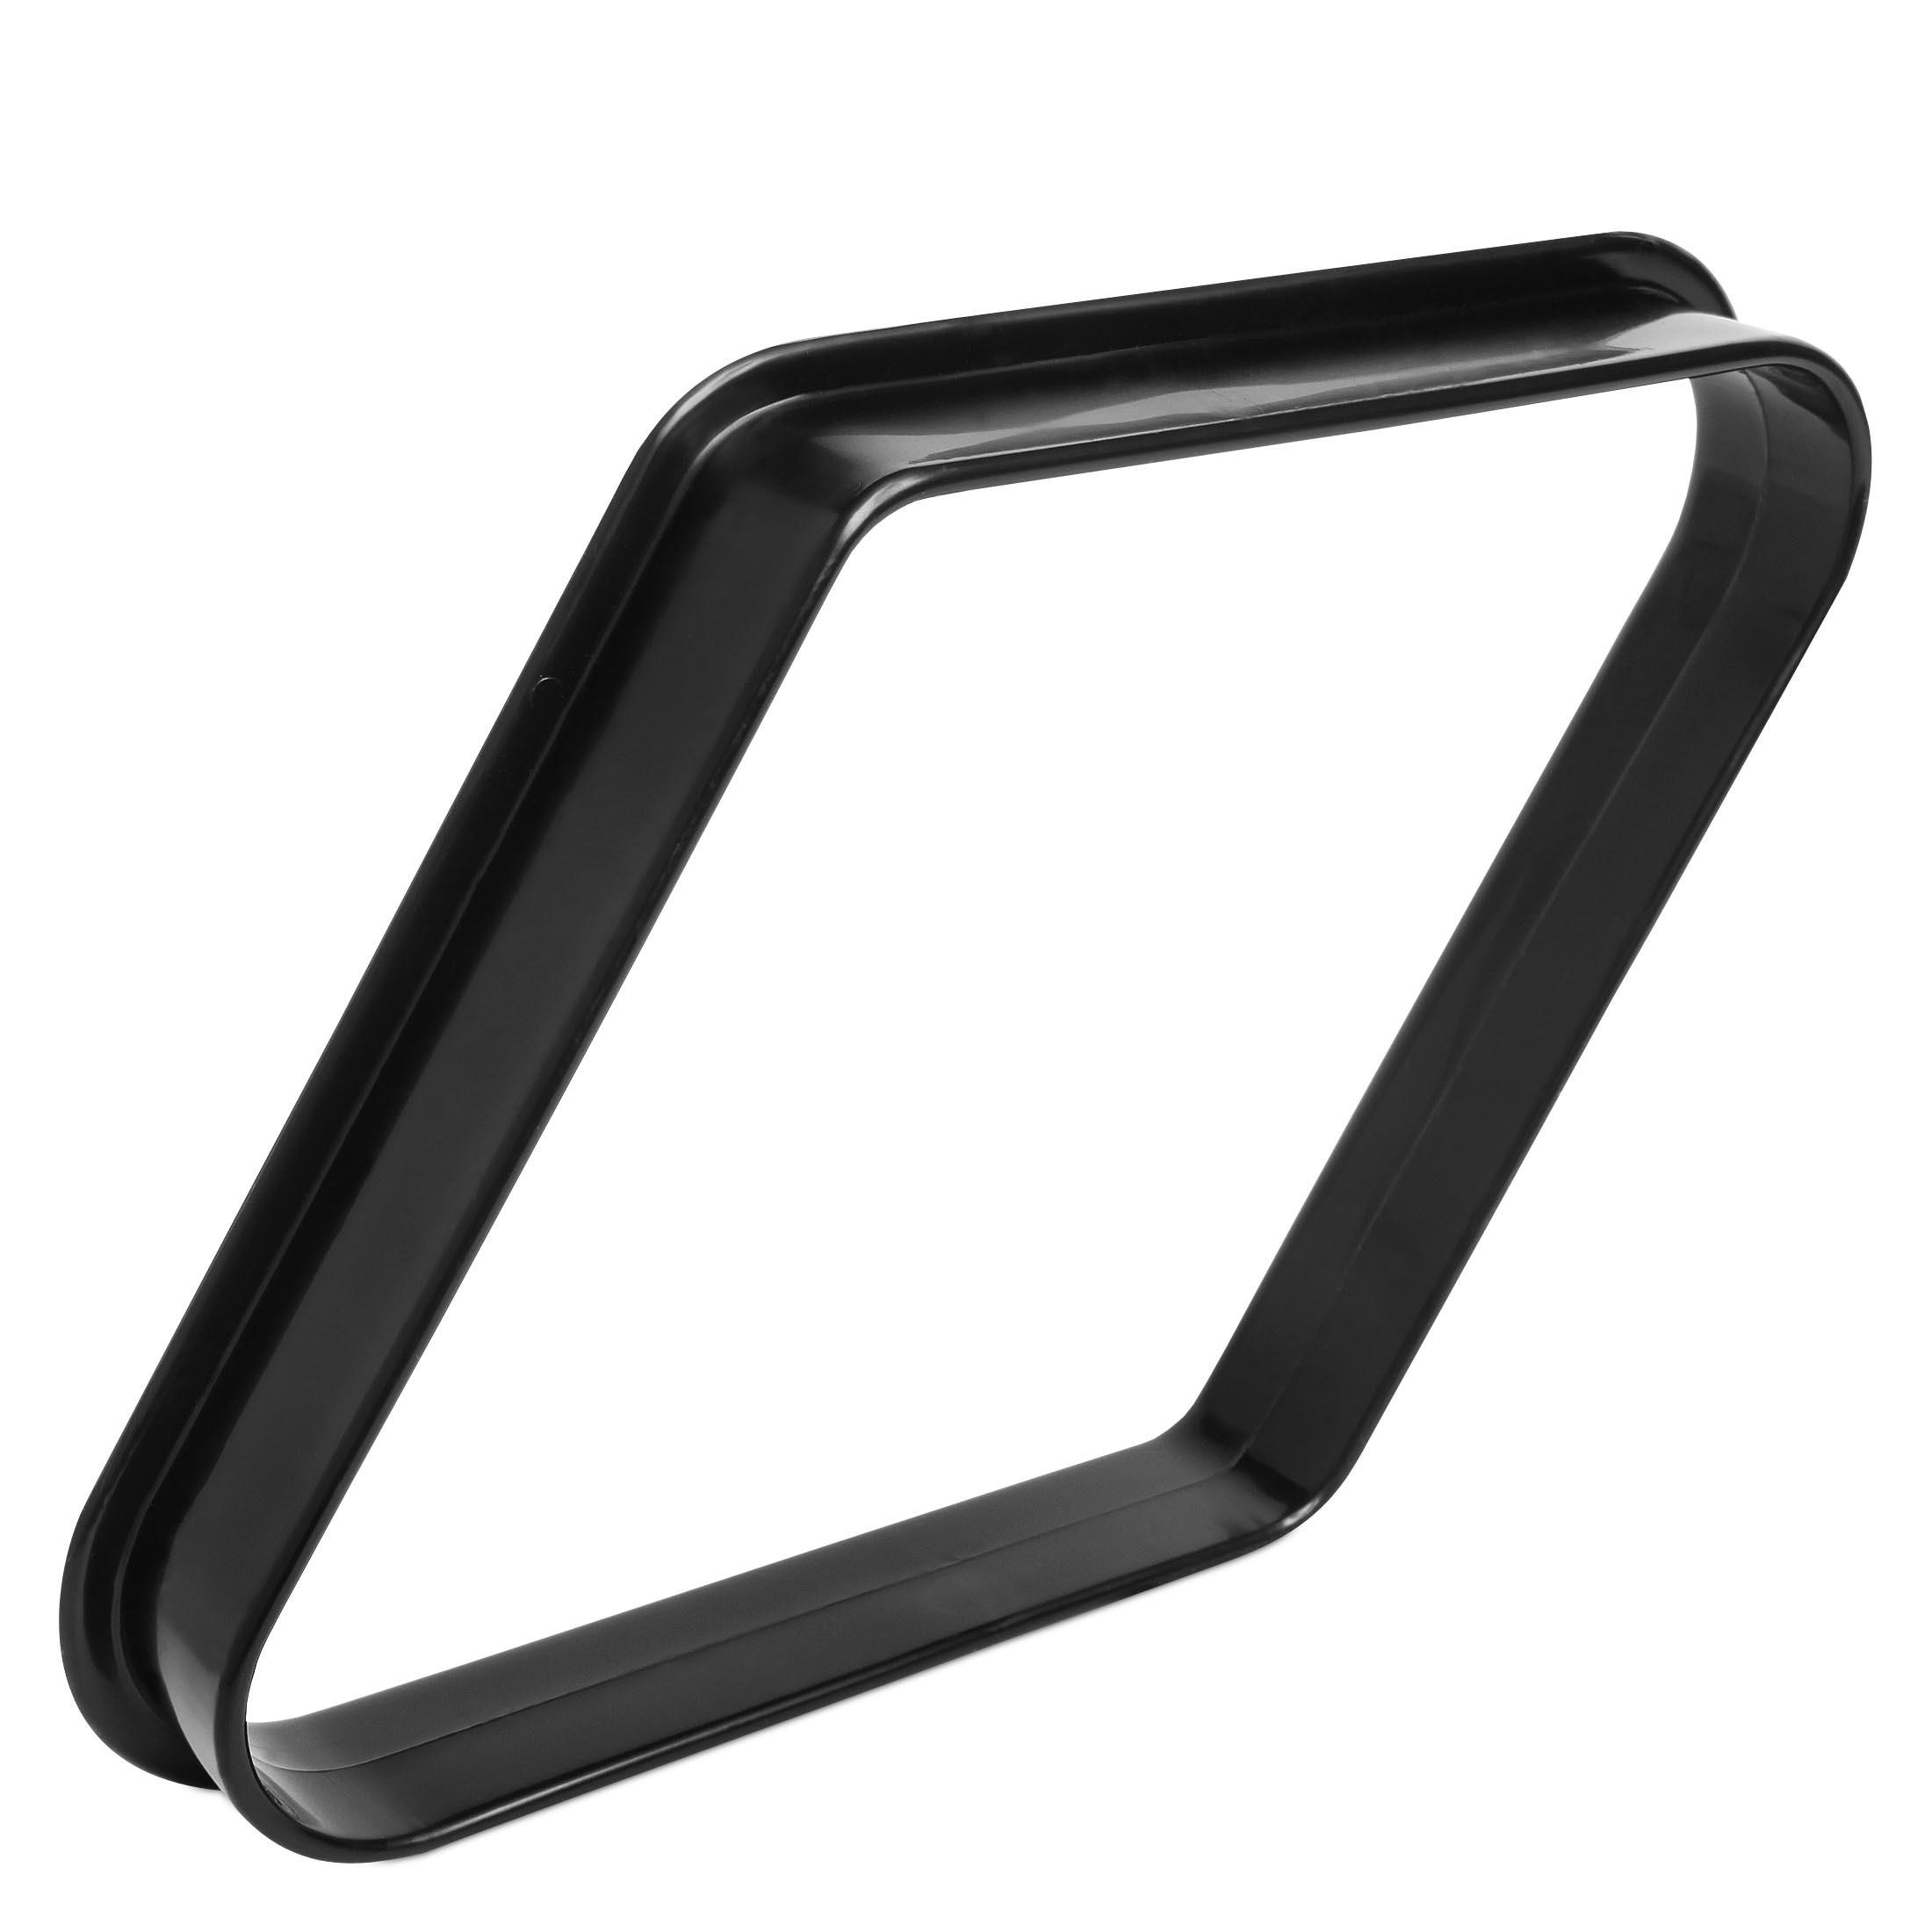 Треугольник - Ромб для пула пластик черный ø57,2мм